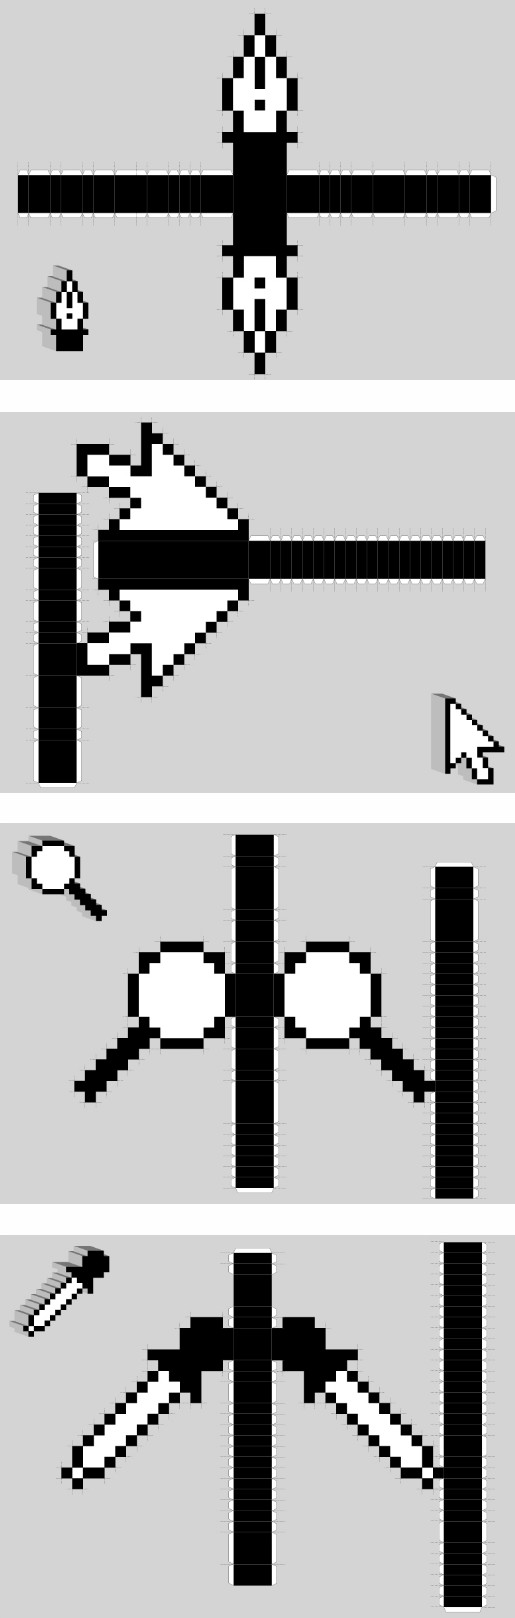 papercraft_icone_1